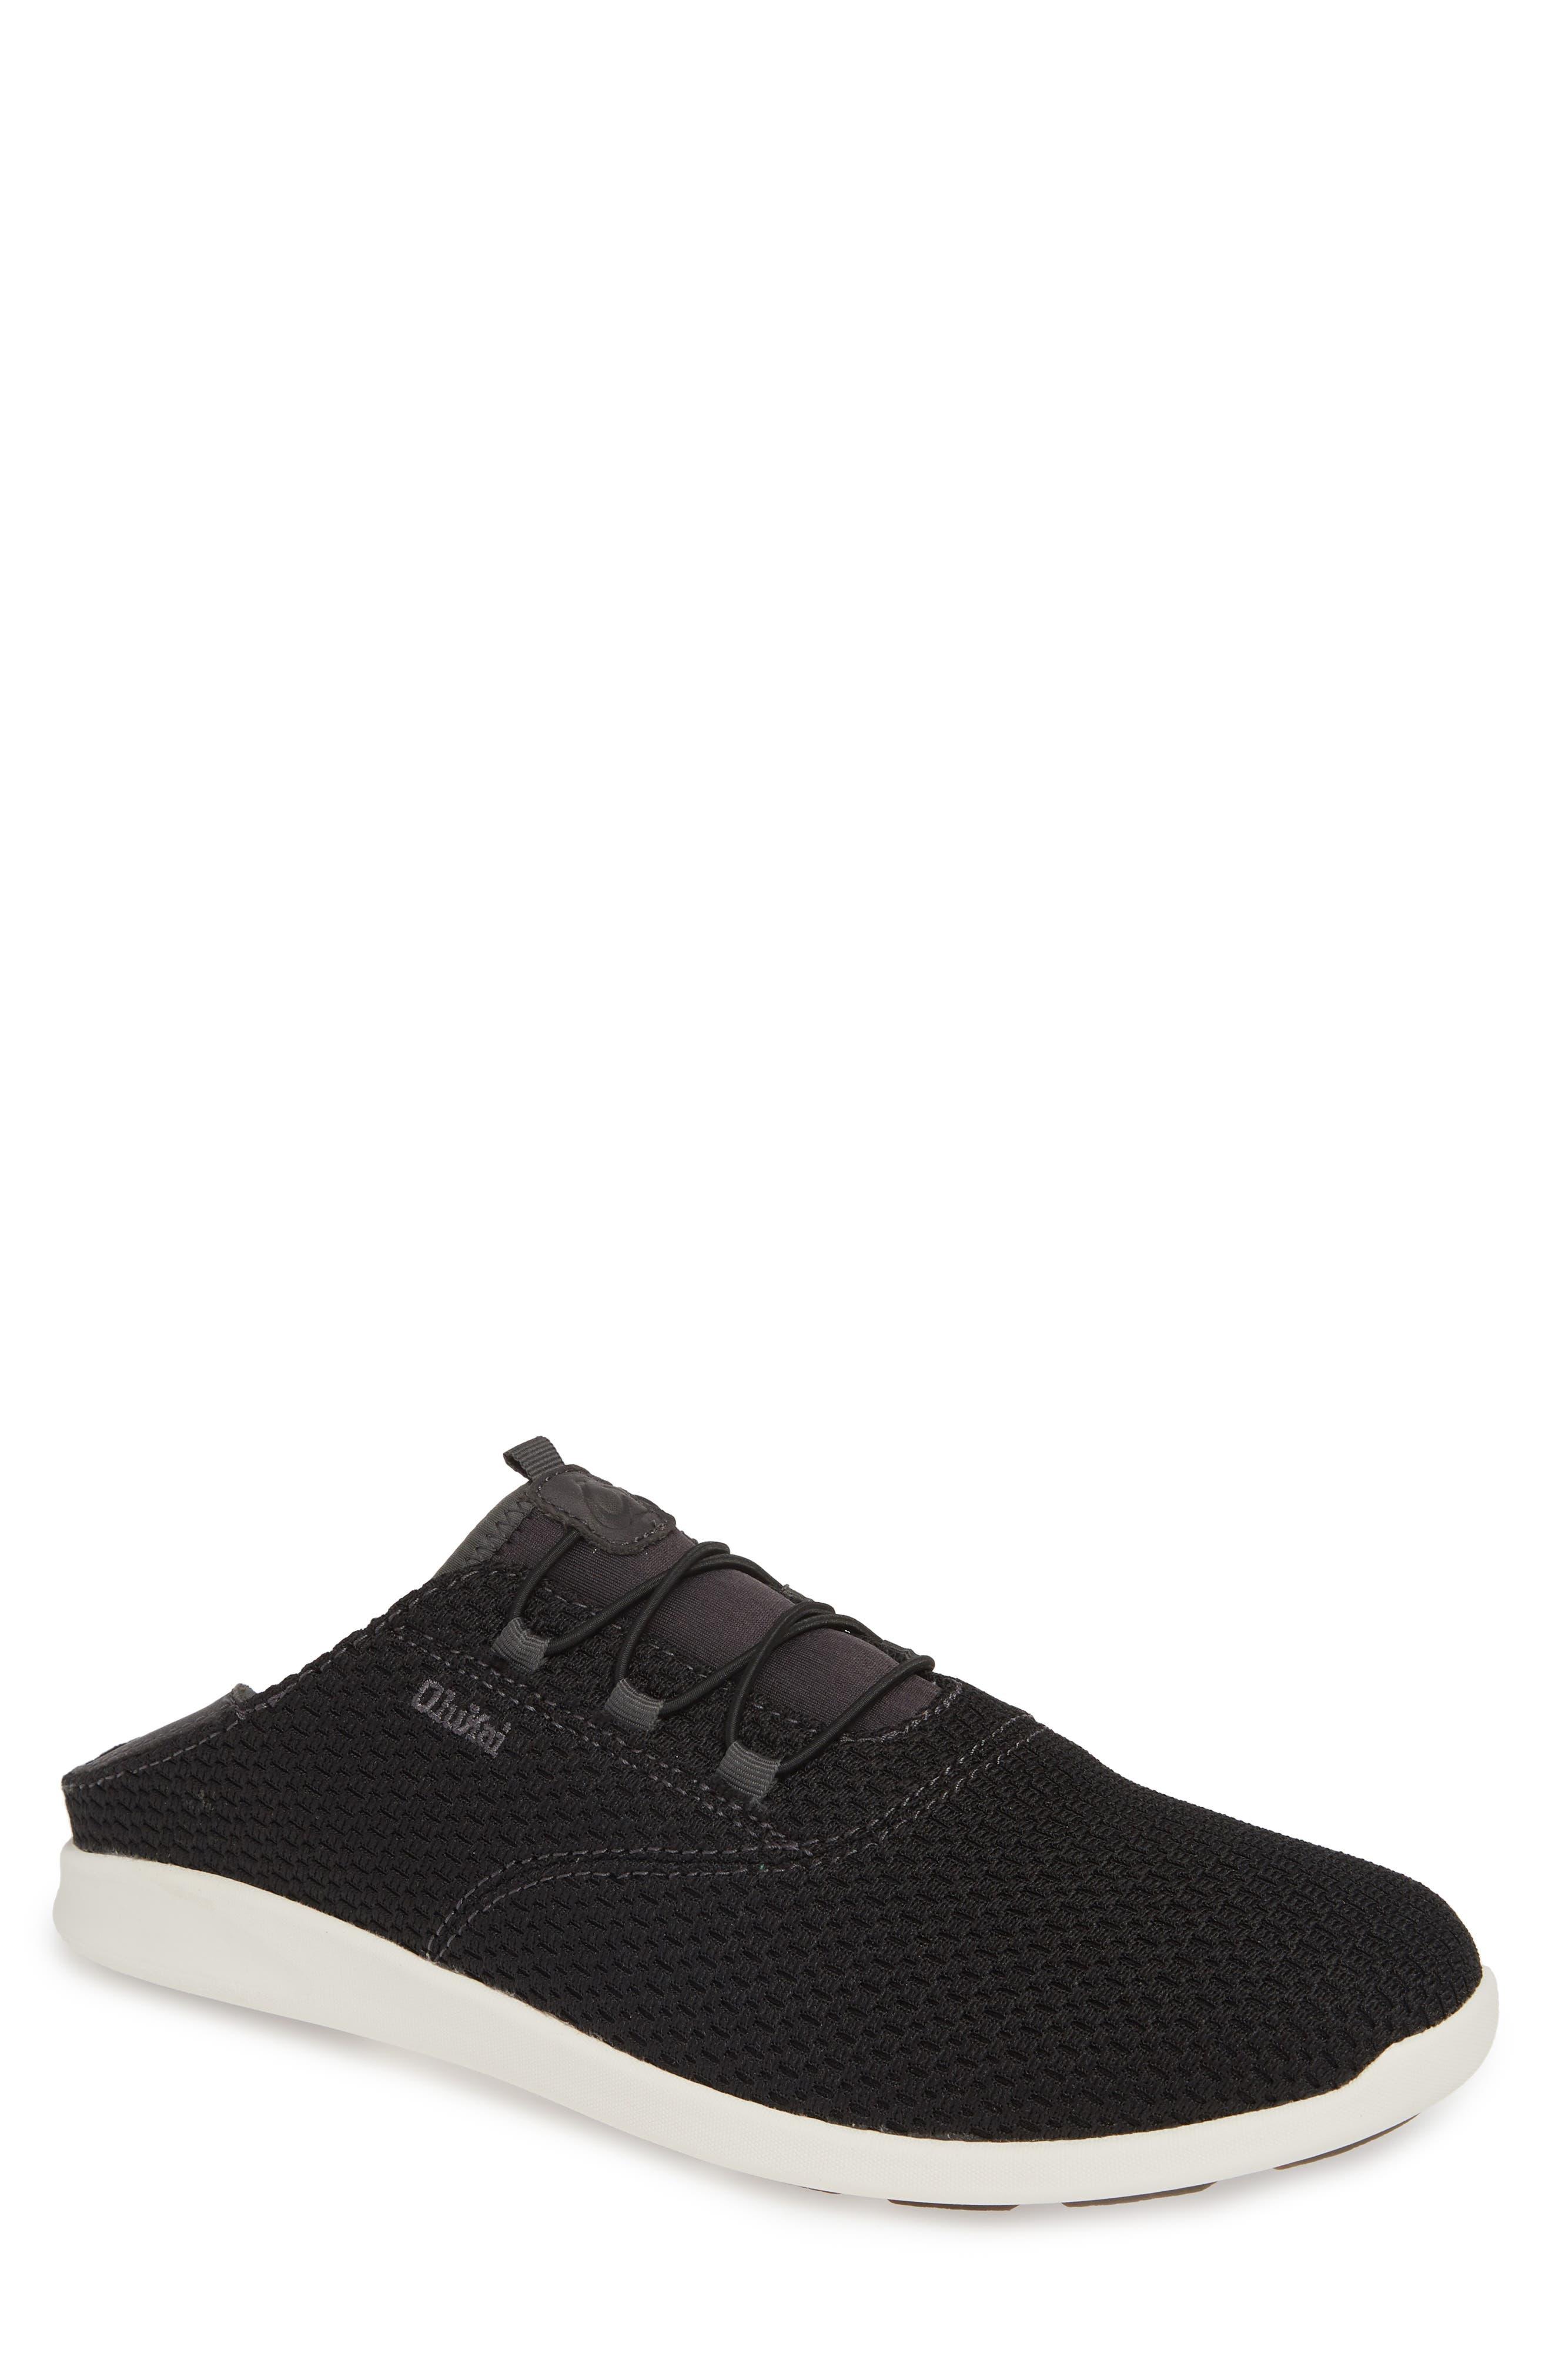 OLUKAI Alapa Li Sneaker, Main, color, BLACK/ DARK SHADOW MESH